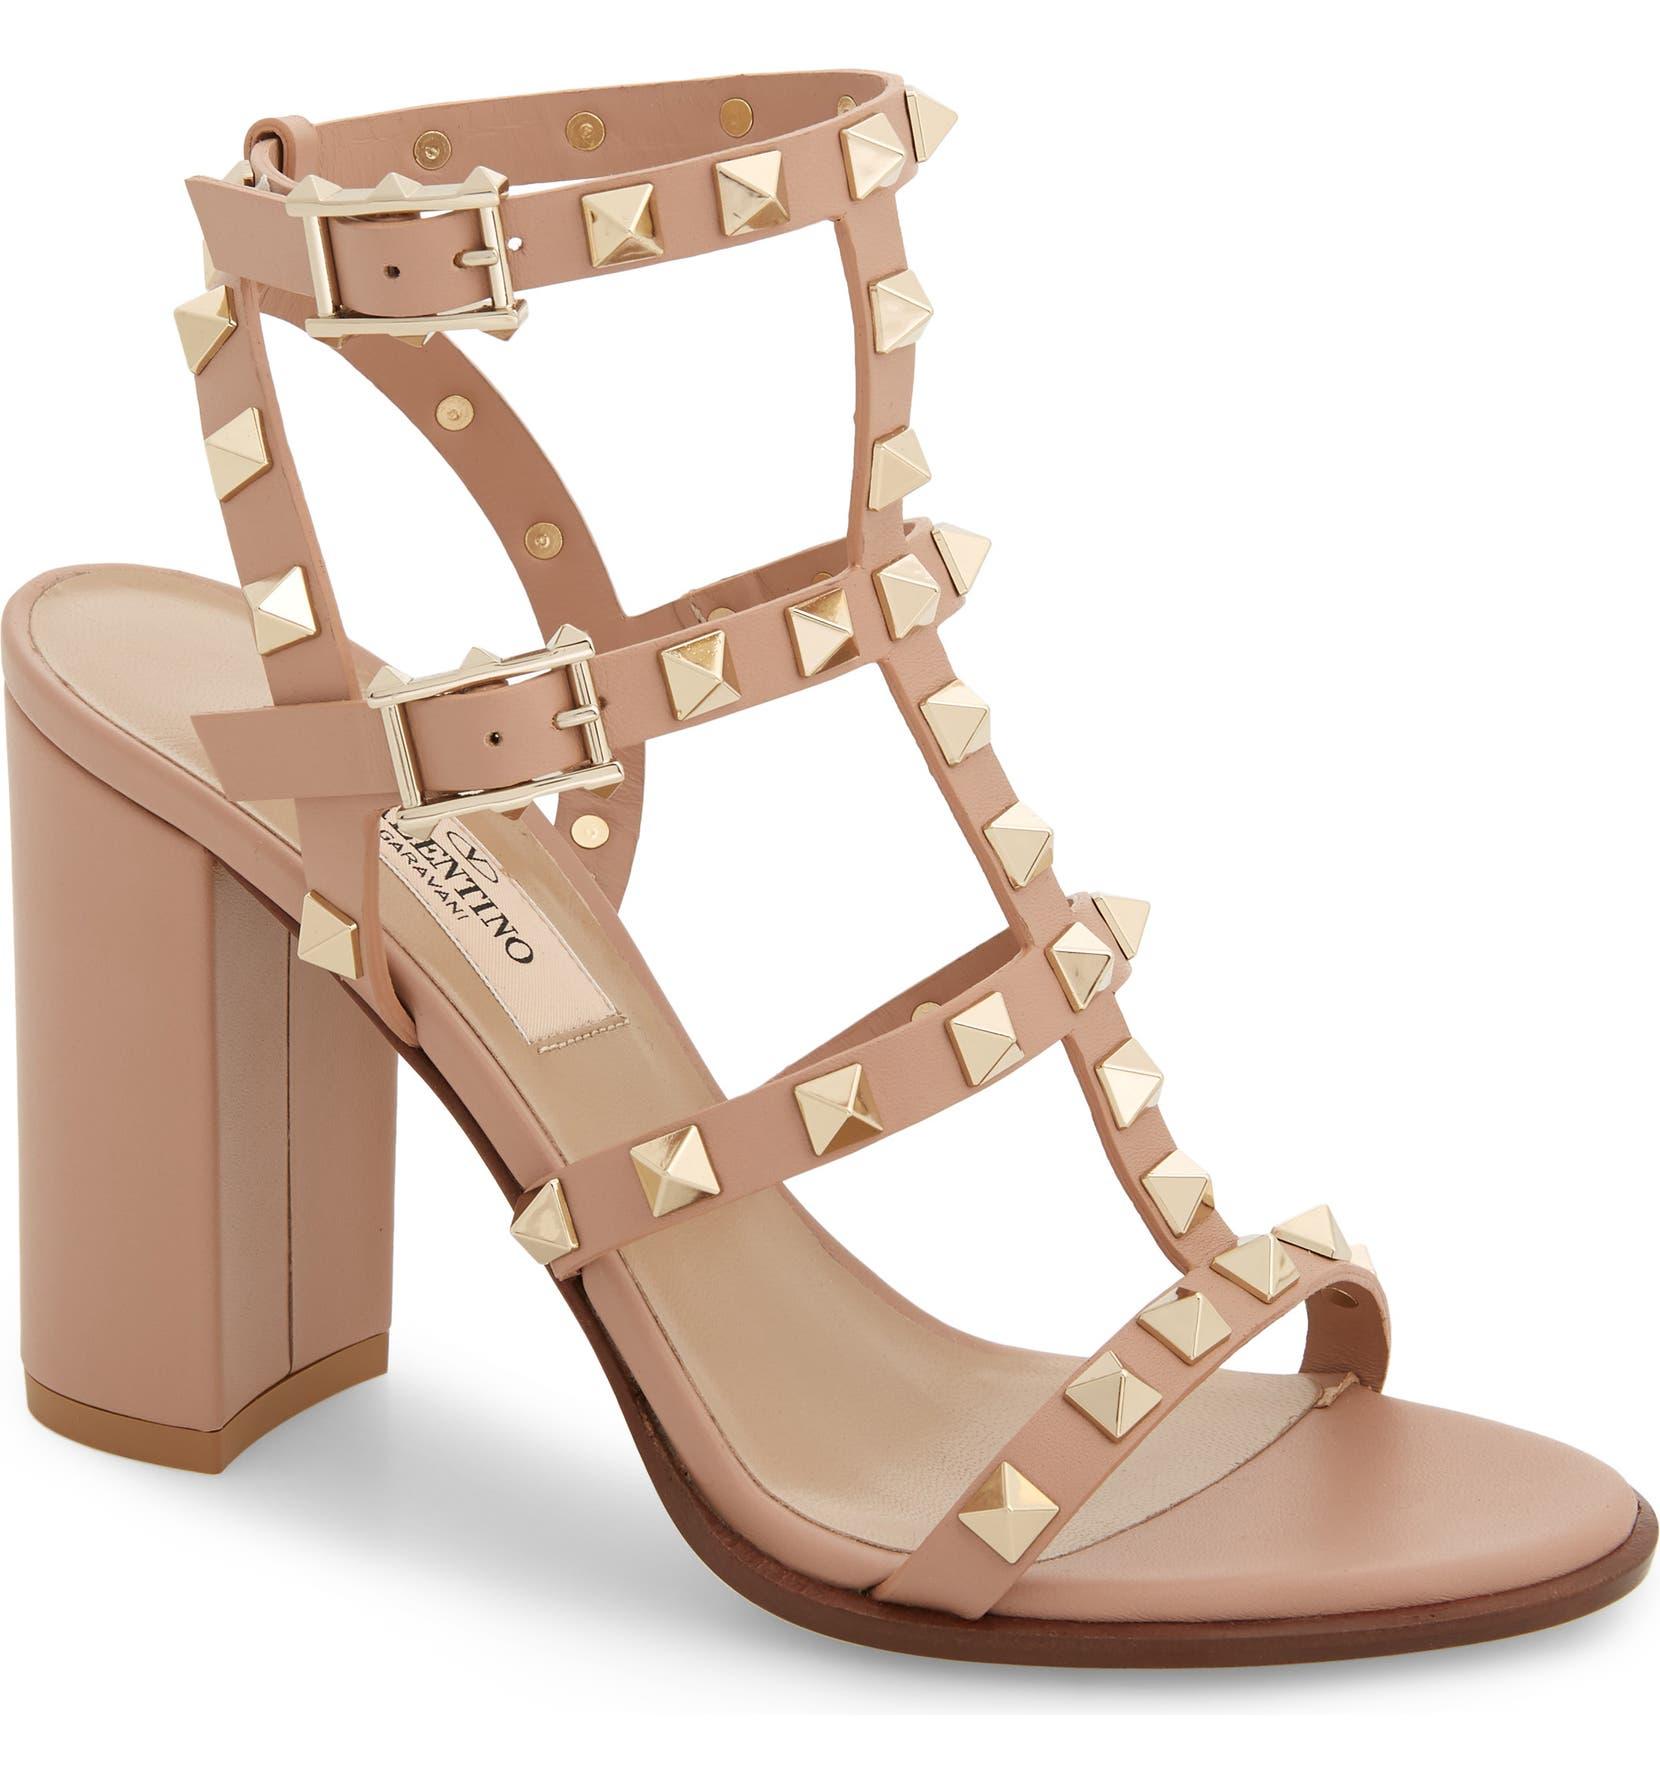 2e22027be9cd VALENTINO GARAVANI  Rockstud  T-Strap Sandal (Women)